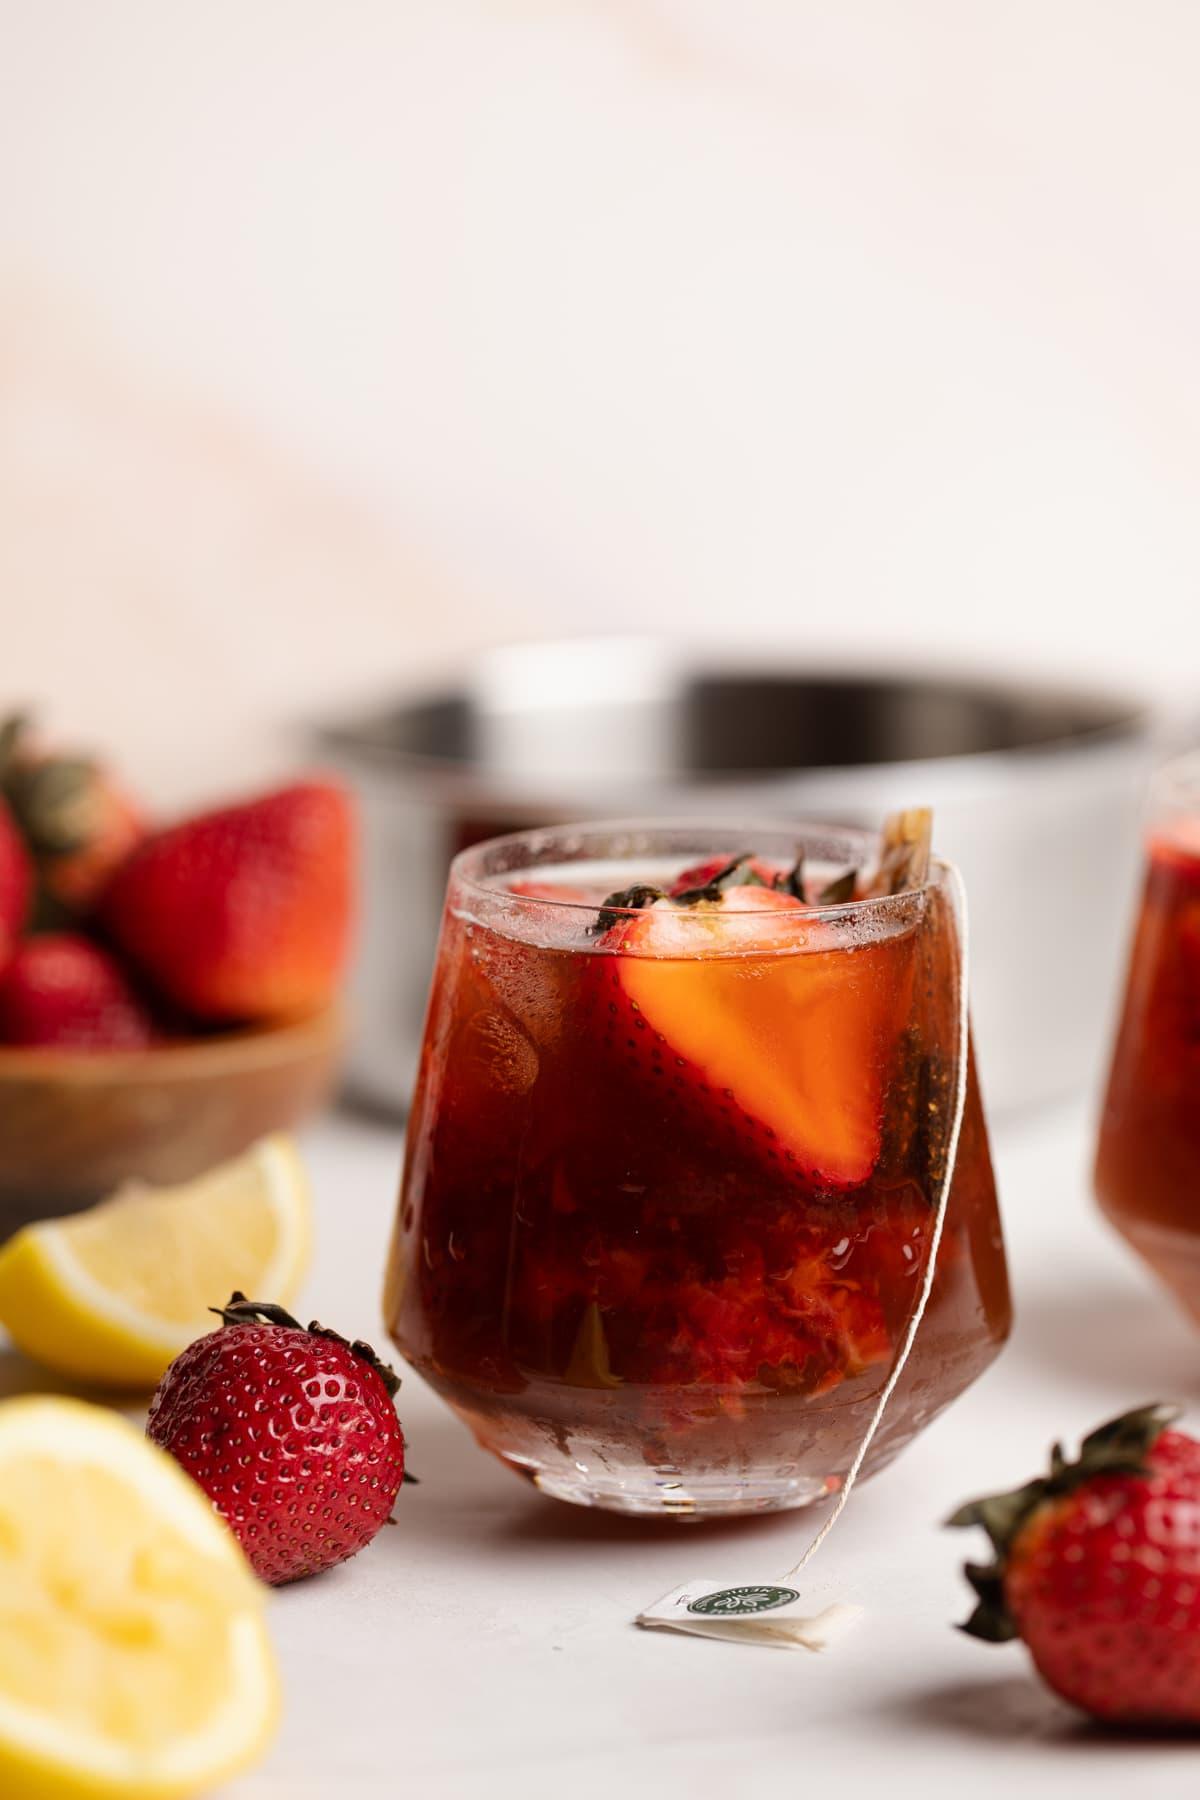 Roasted Dandelion Strawberry Drink